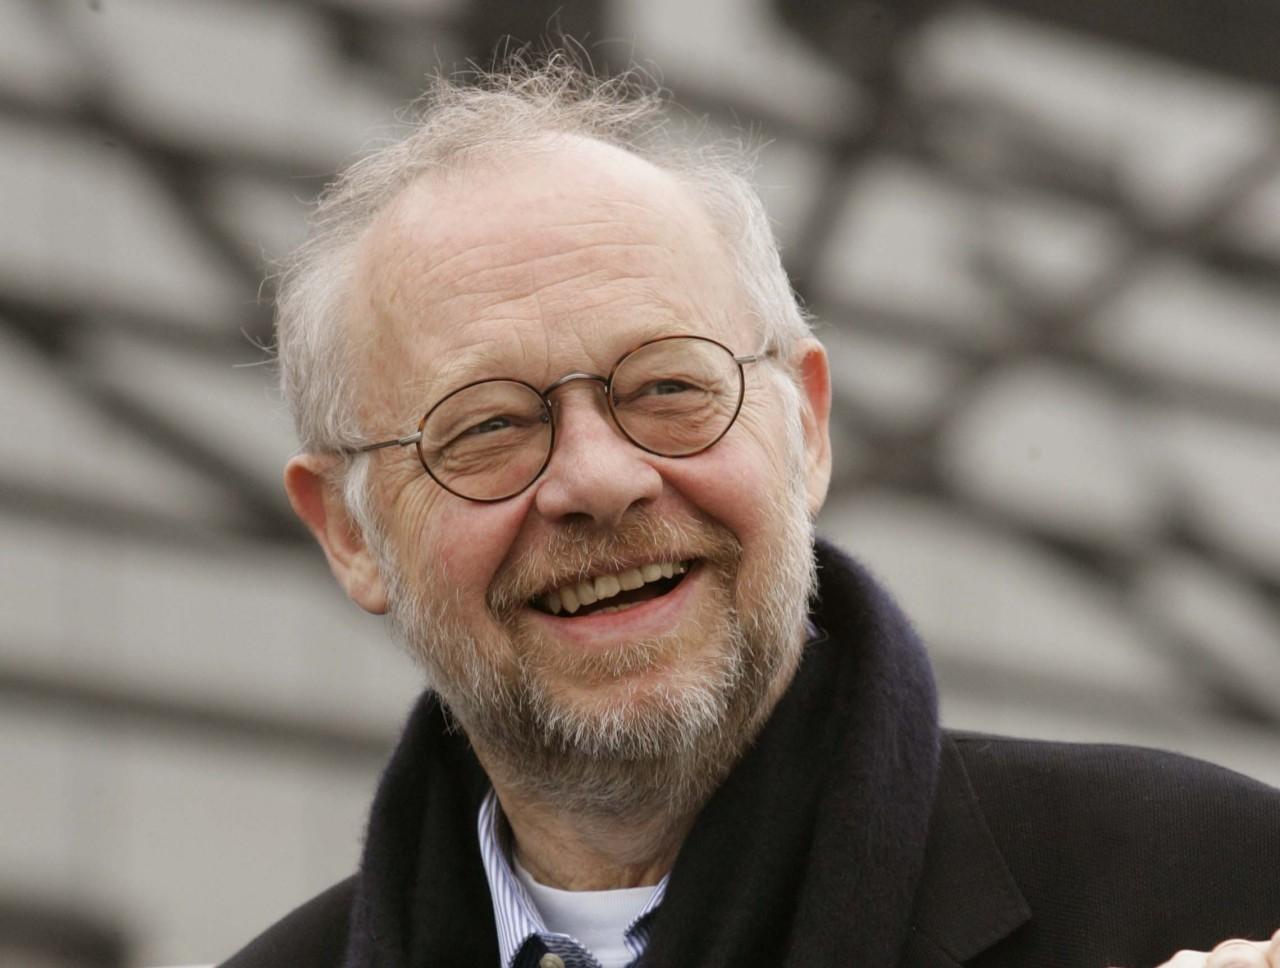 Prof. Dr. h.c. Jürgen Flimm